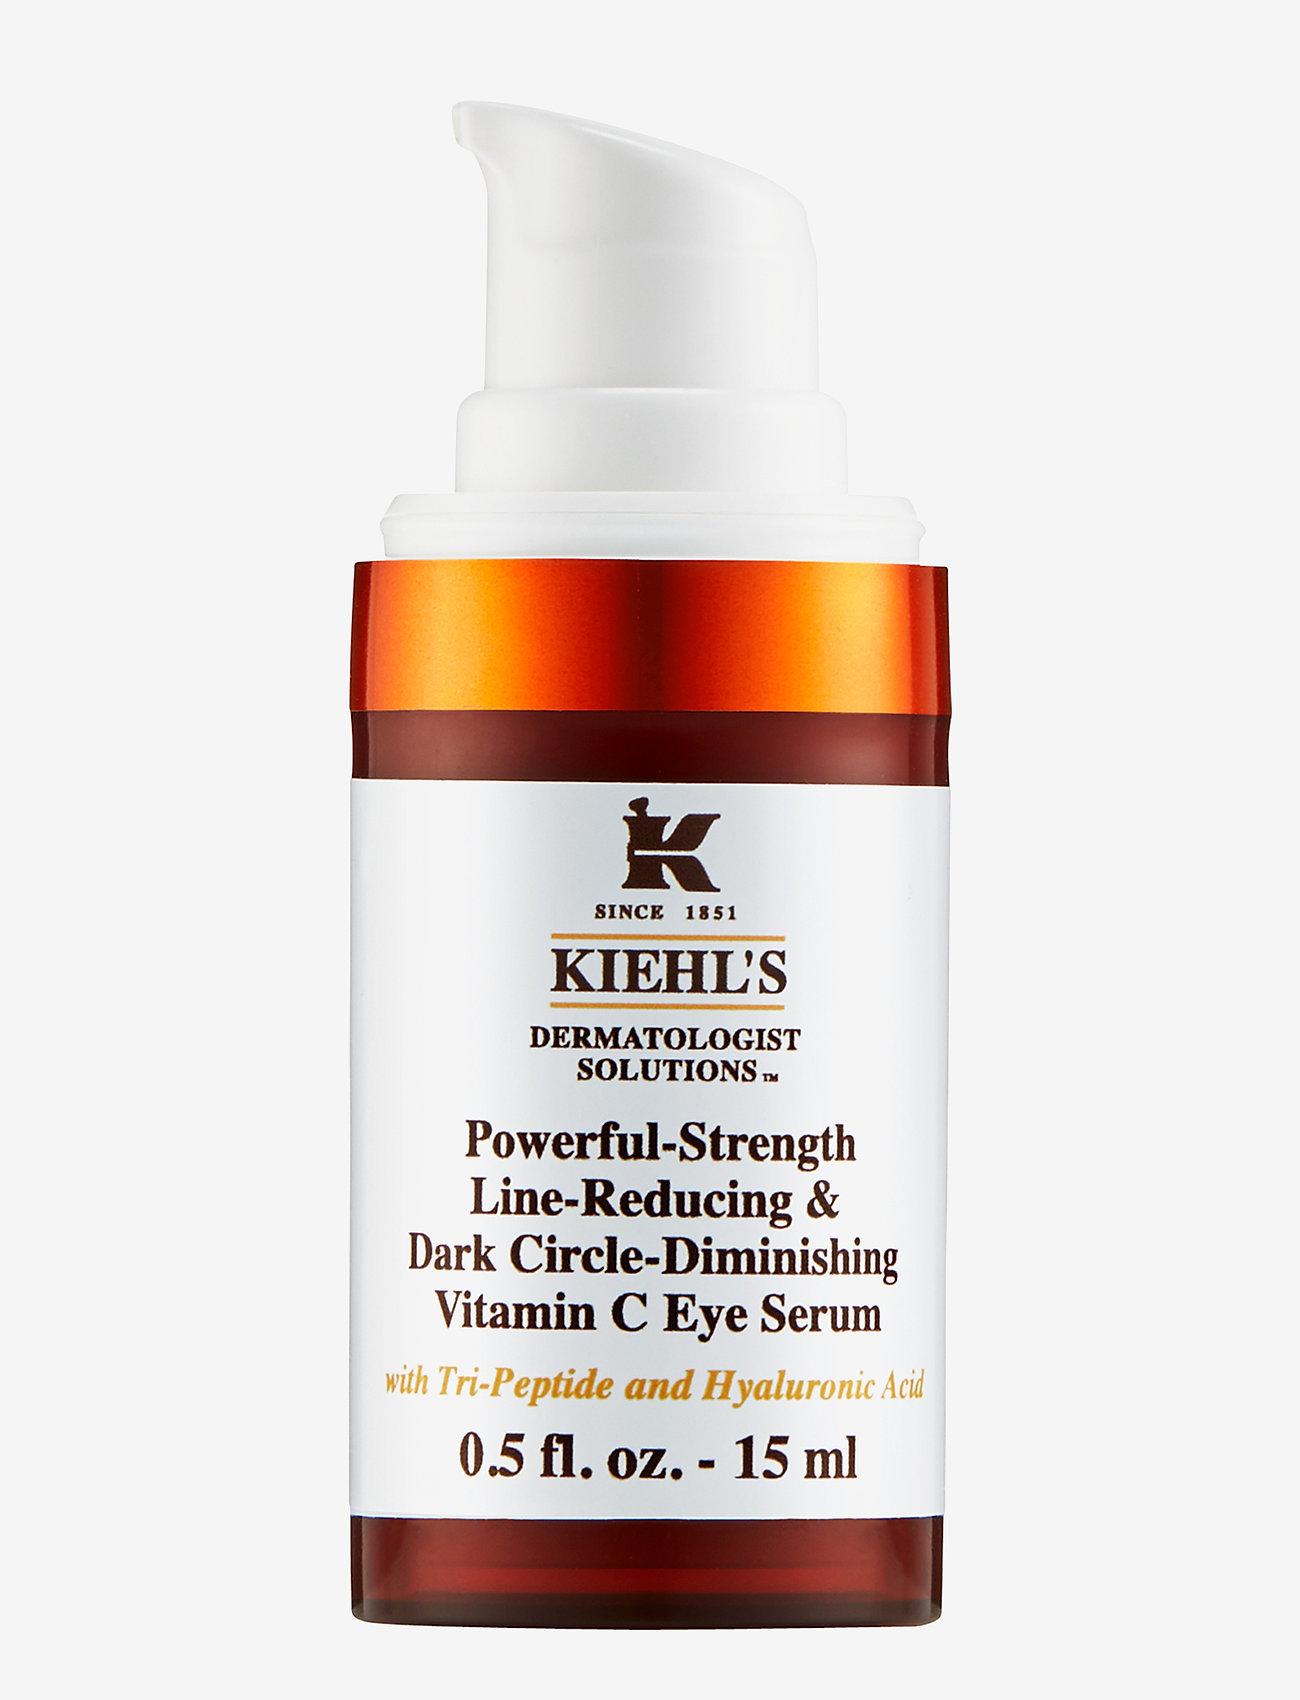 Kiehl's - Powerful-Strenght Line-Reducing & Dark Circle-Diminishing Vi - silmänympärysvoide - clear